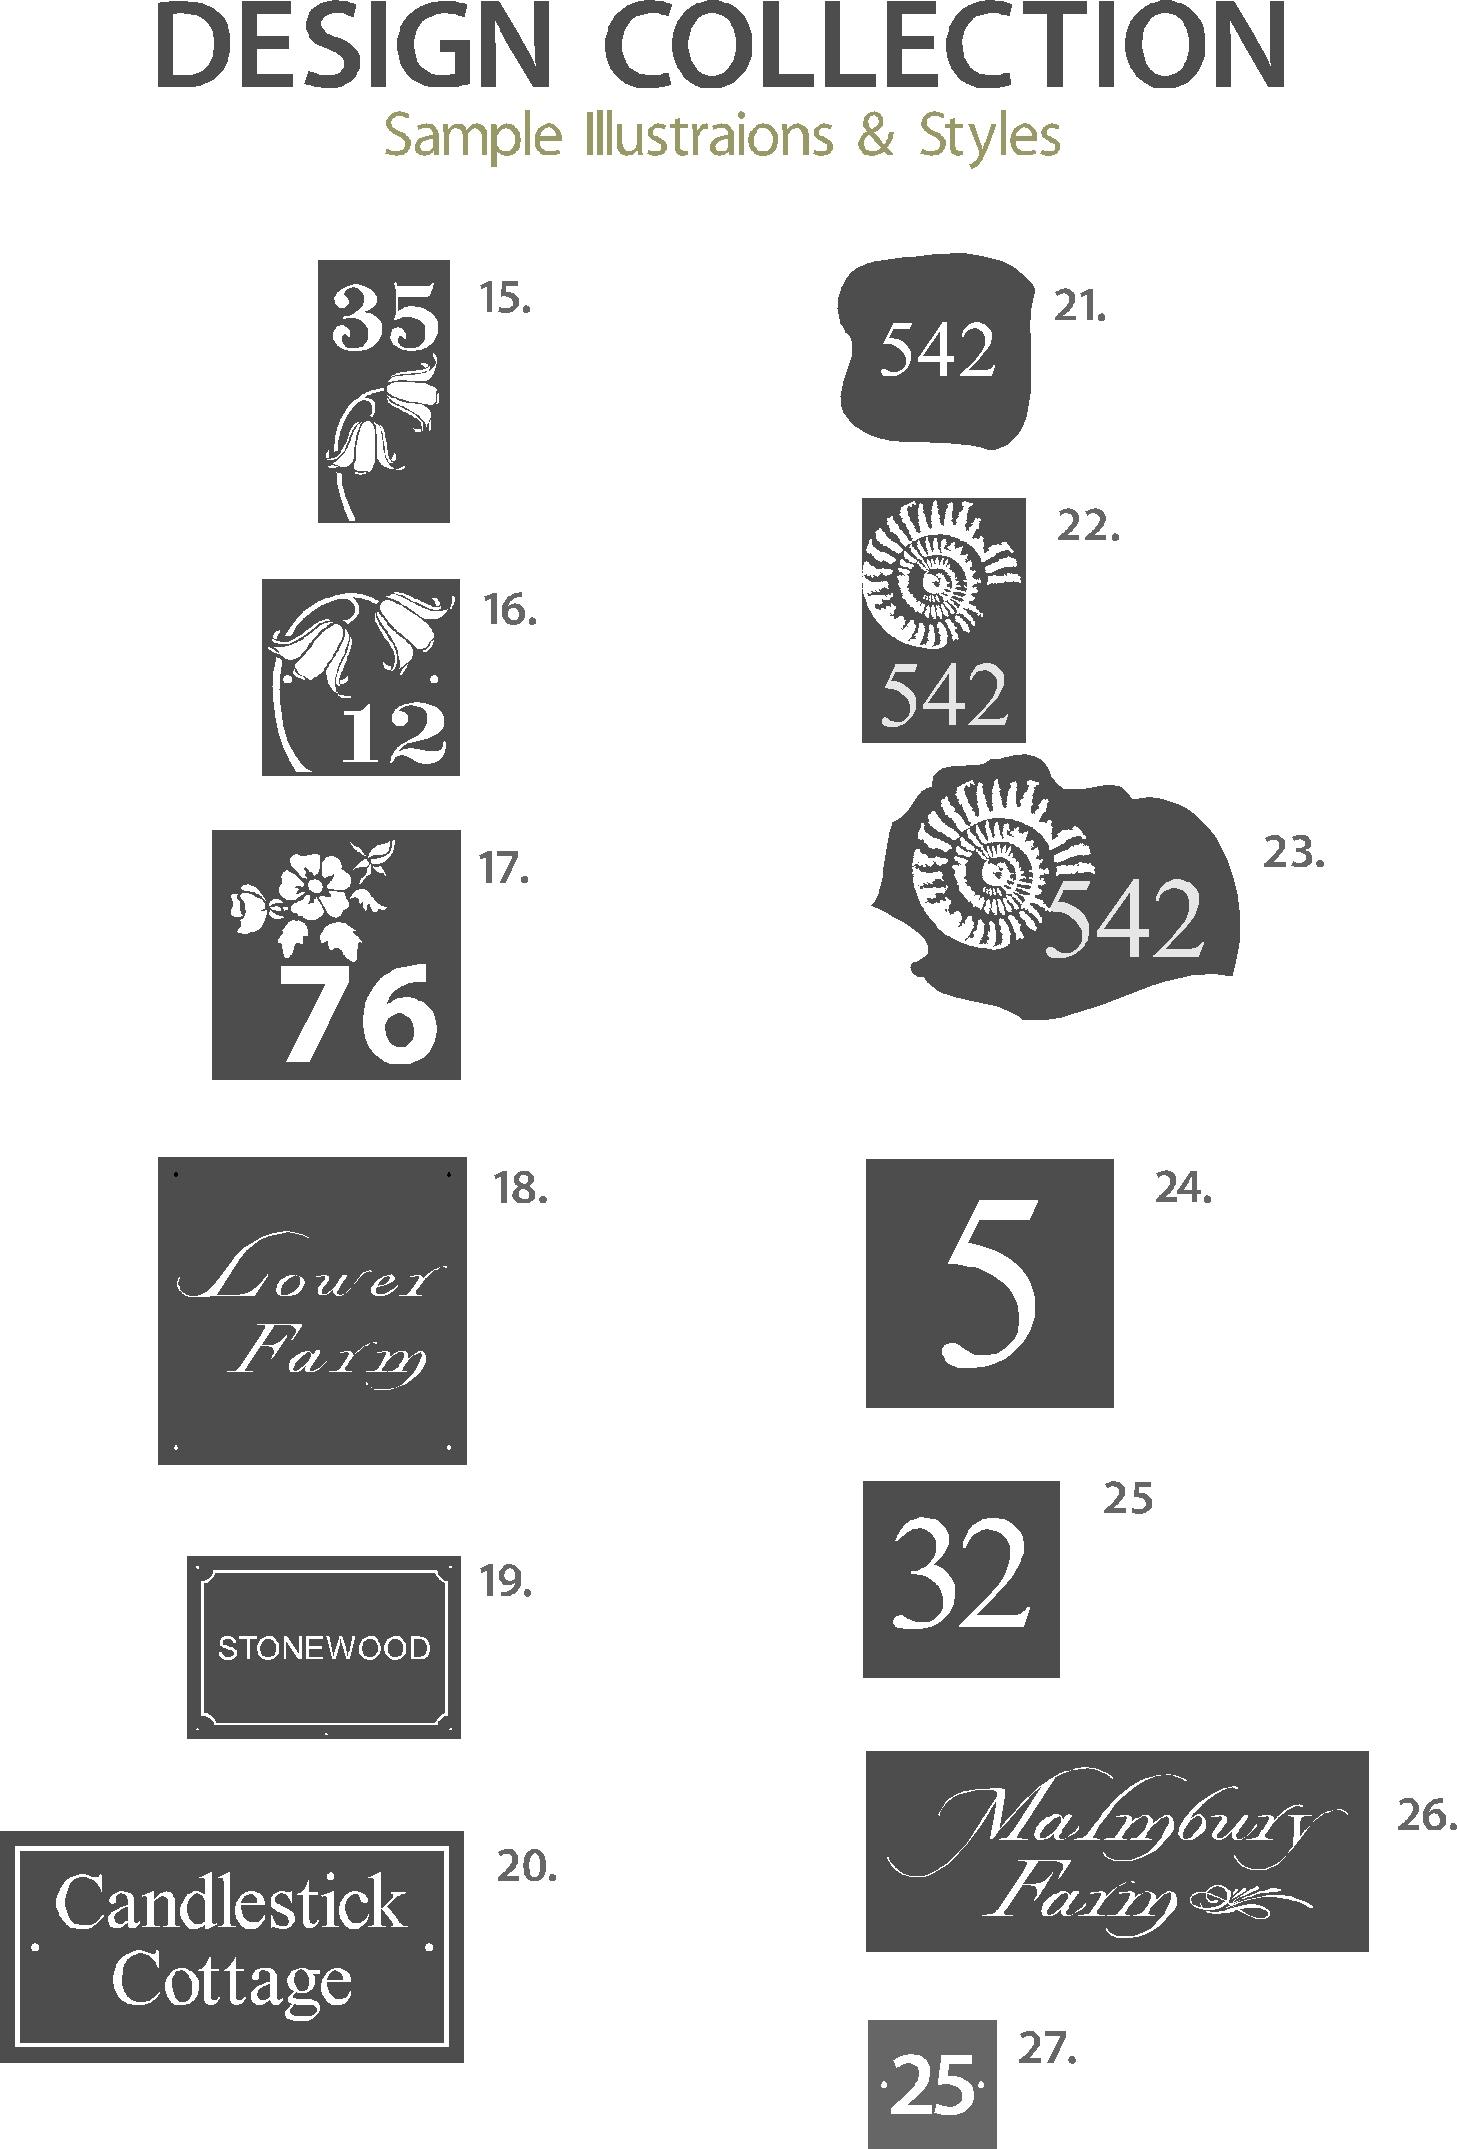 Slate Sign Illustration Collection 2